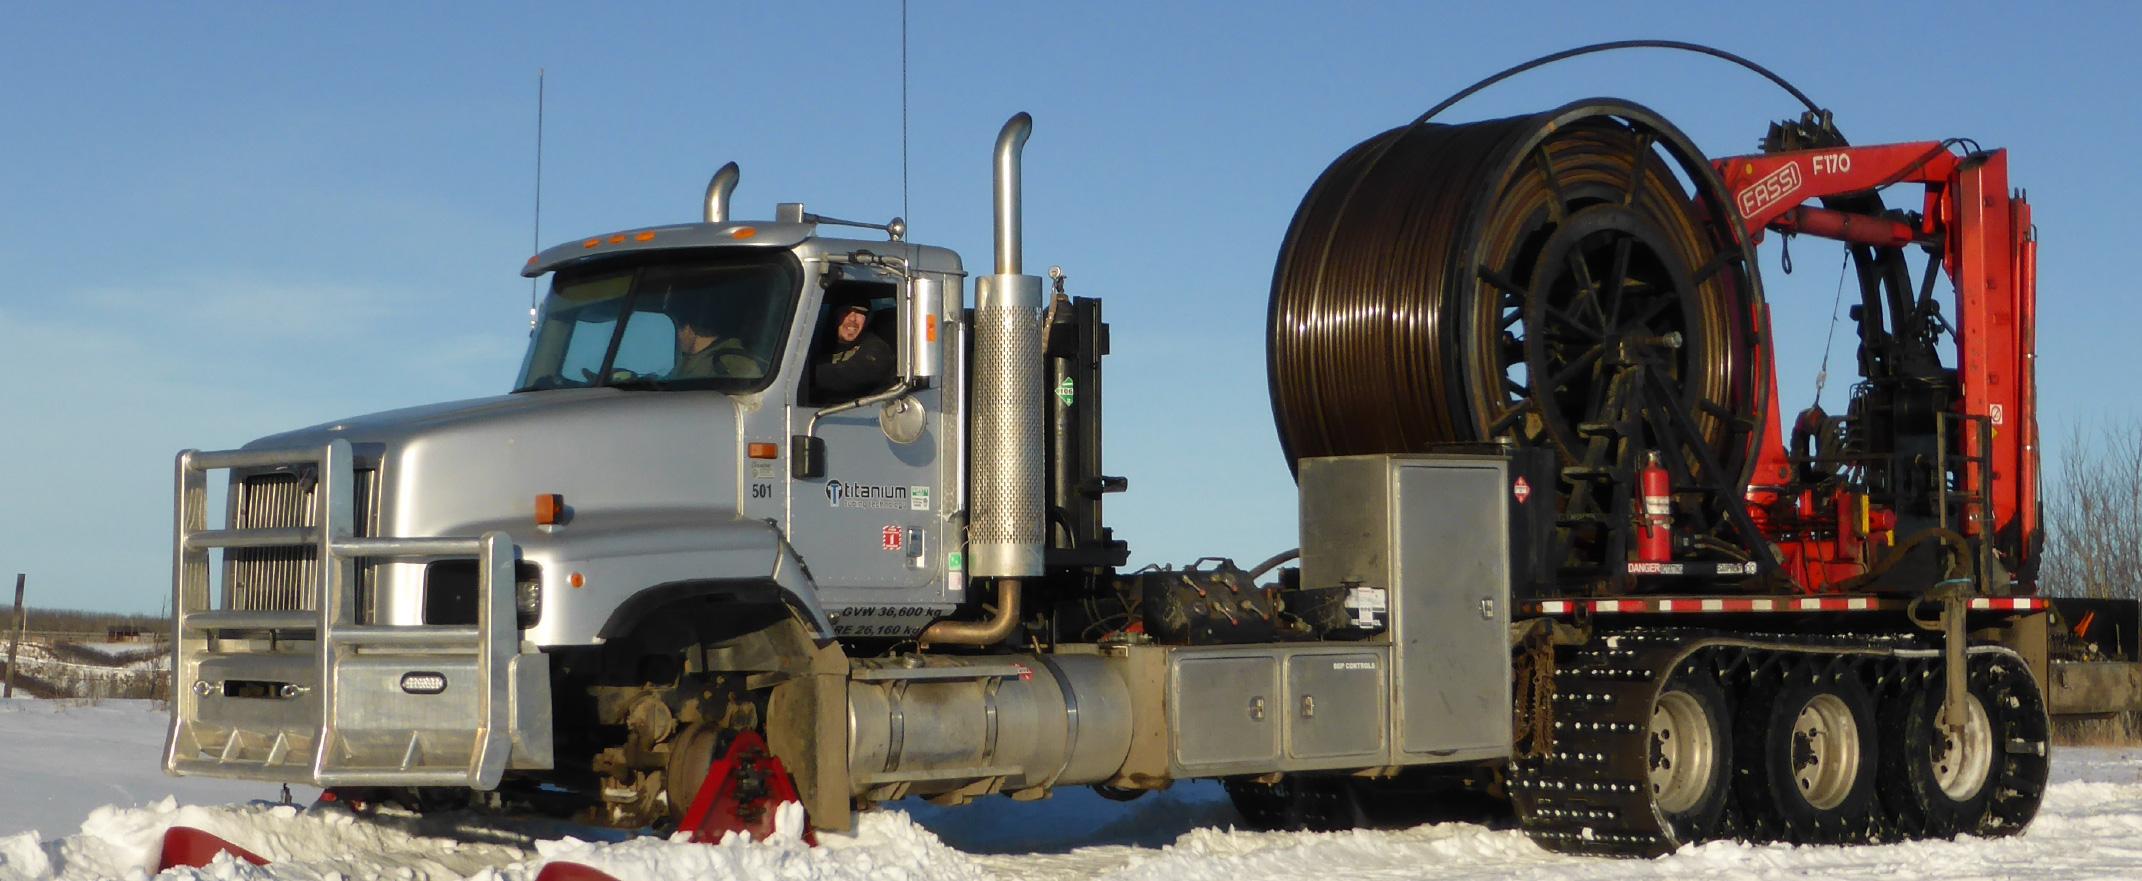 Articulating Truck